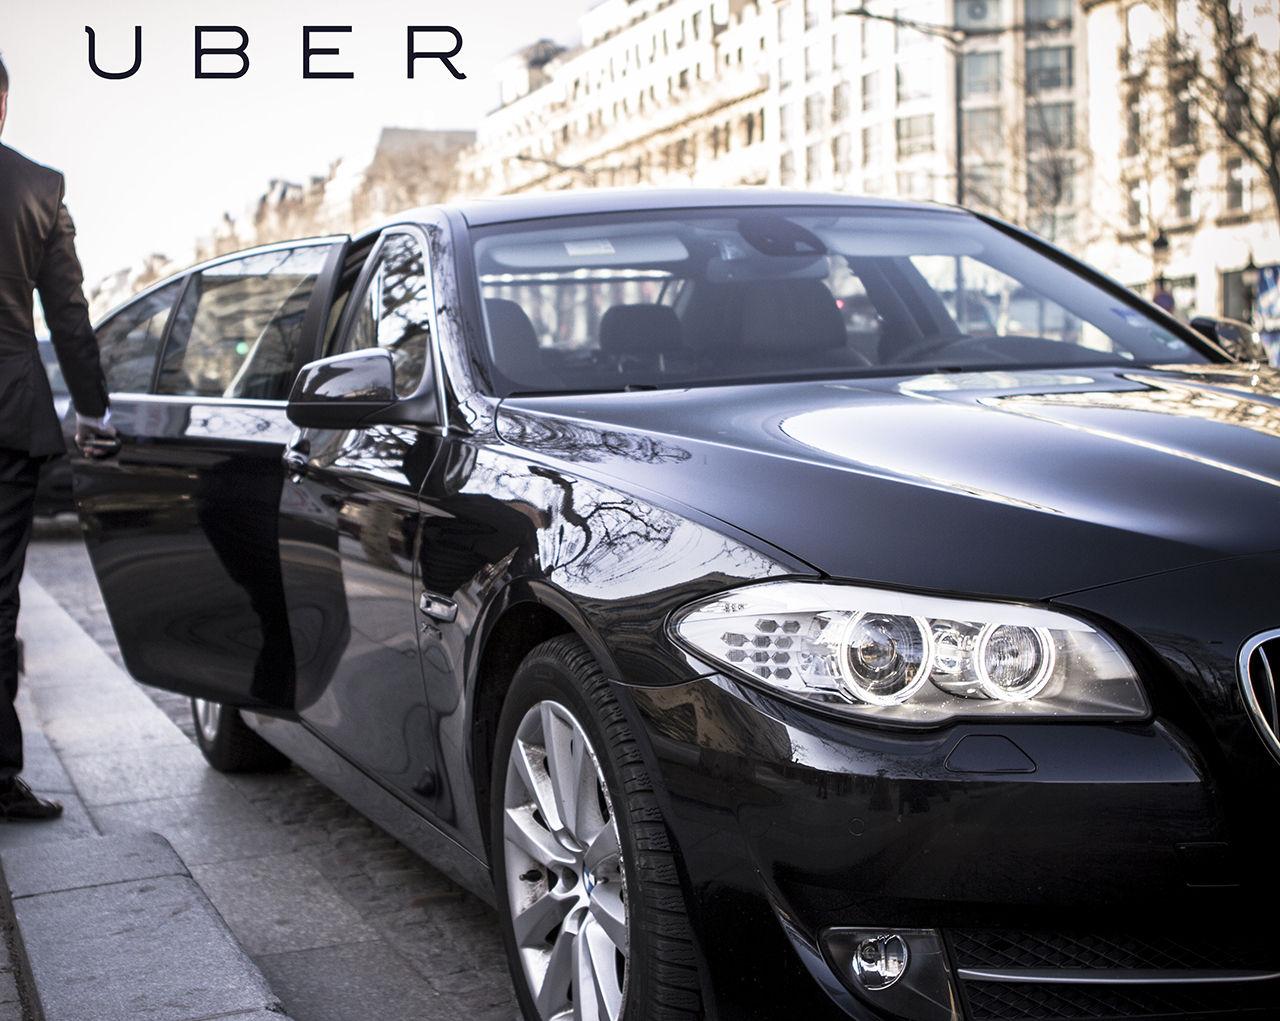 Uber börjar leasa ut bilar